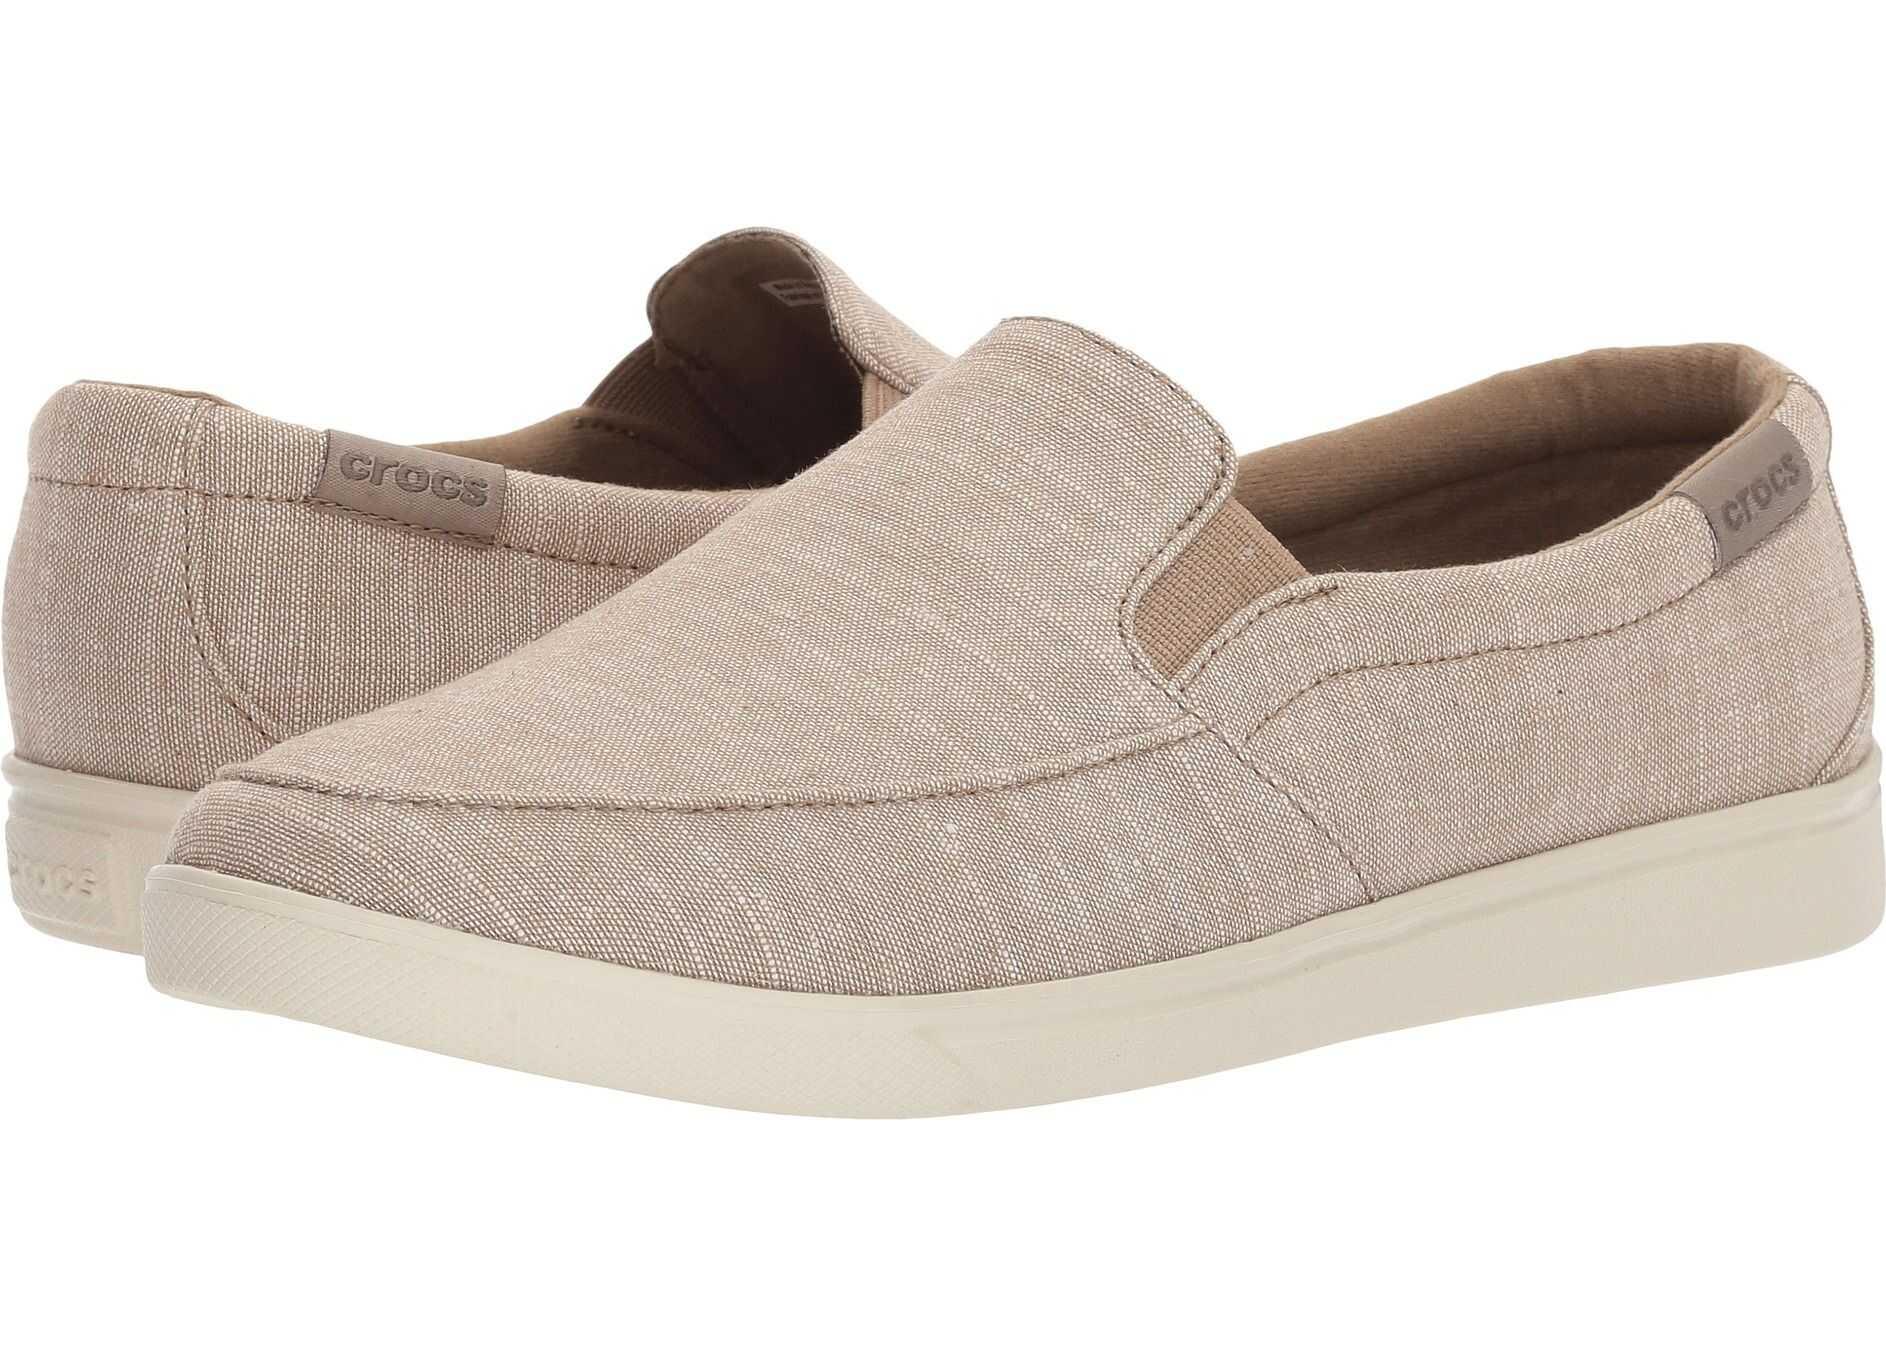 Crocs CitiLane Low Slip-On Khaki